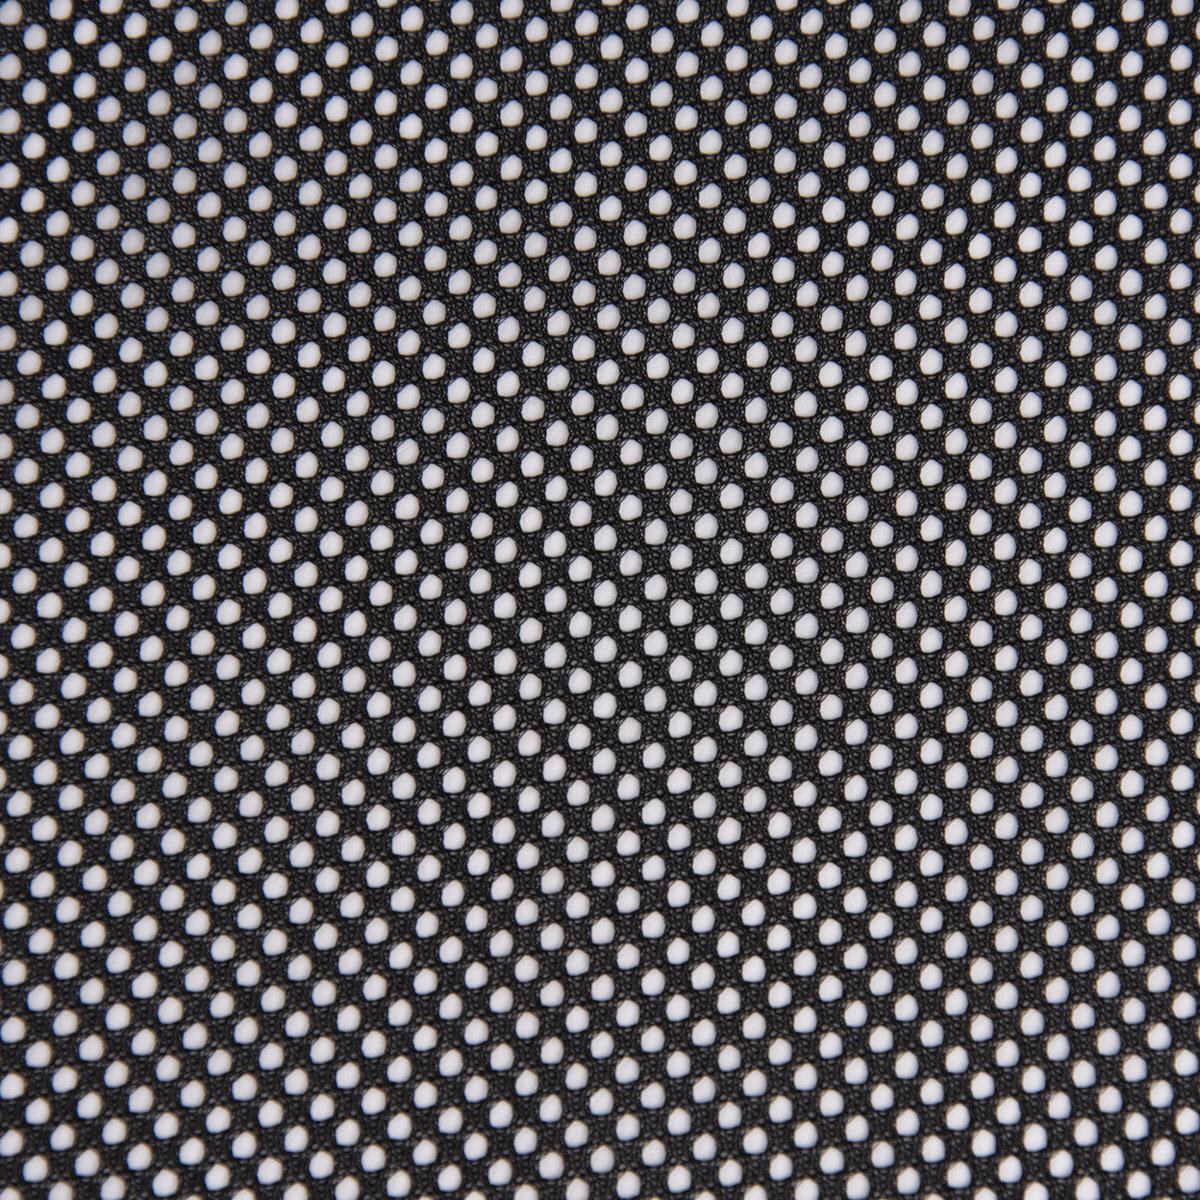 Netzstoff Netzfutter Mesh dünn schwarz 1,48m Breite